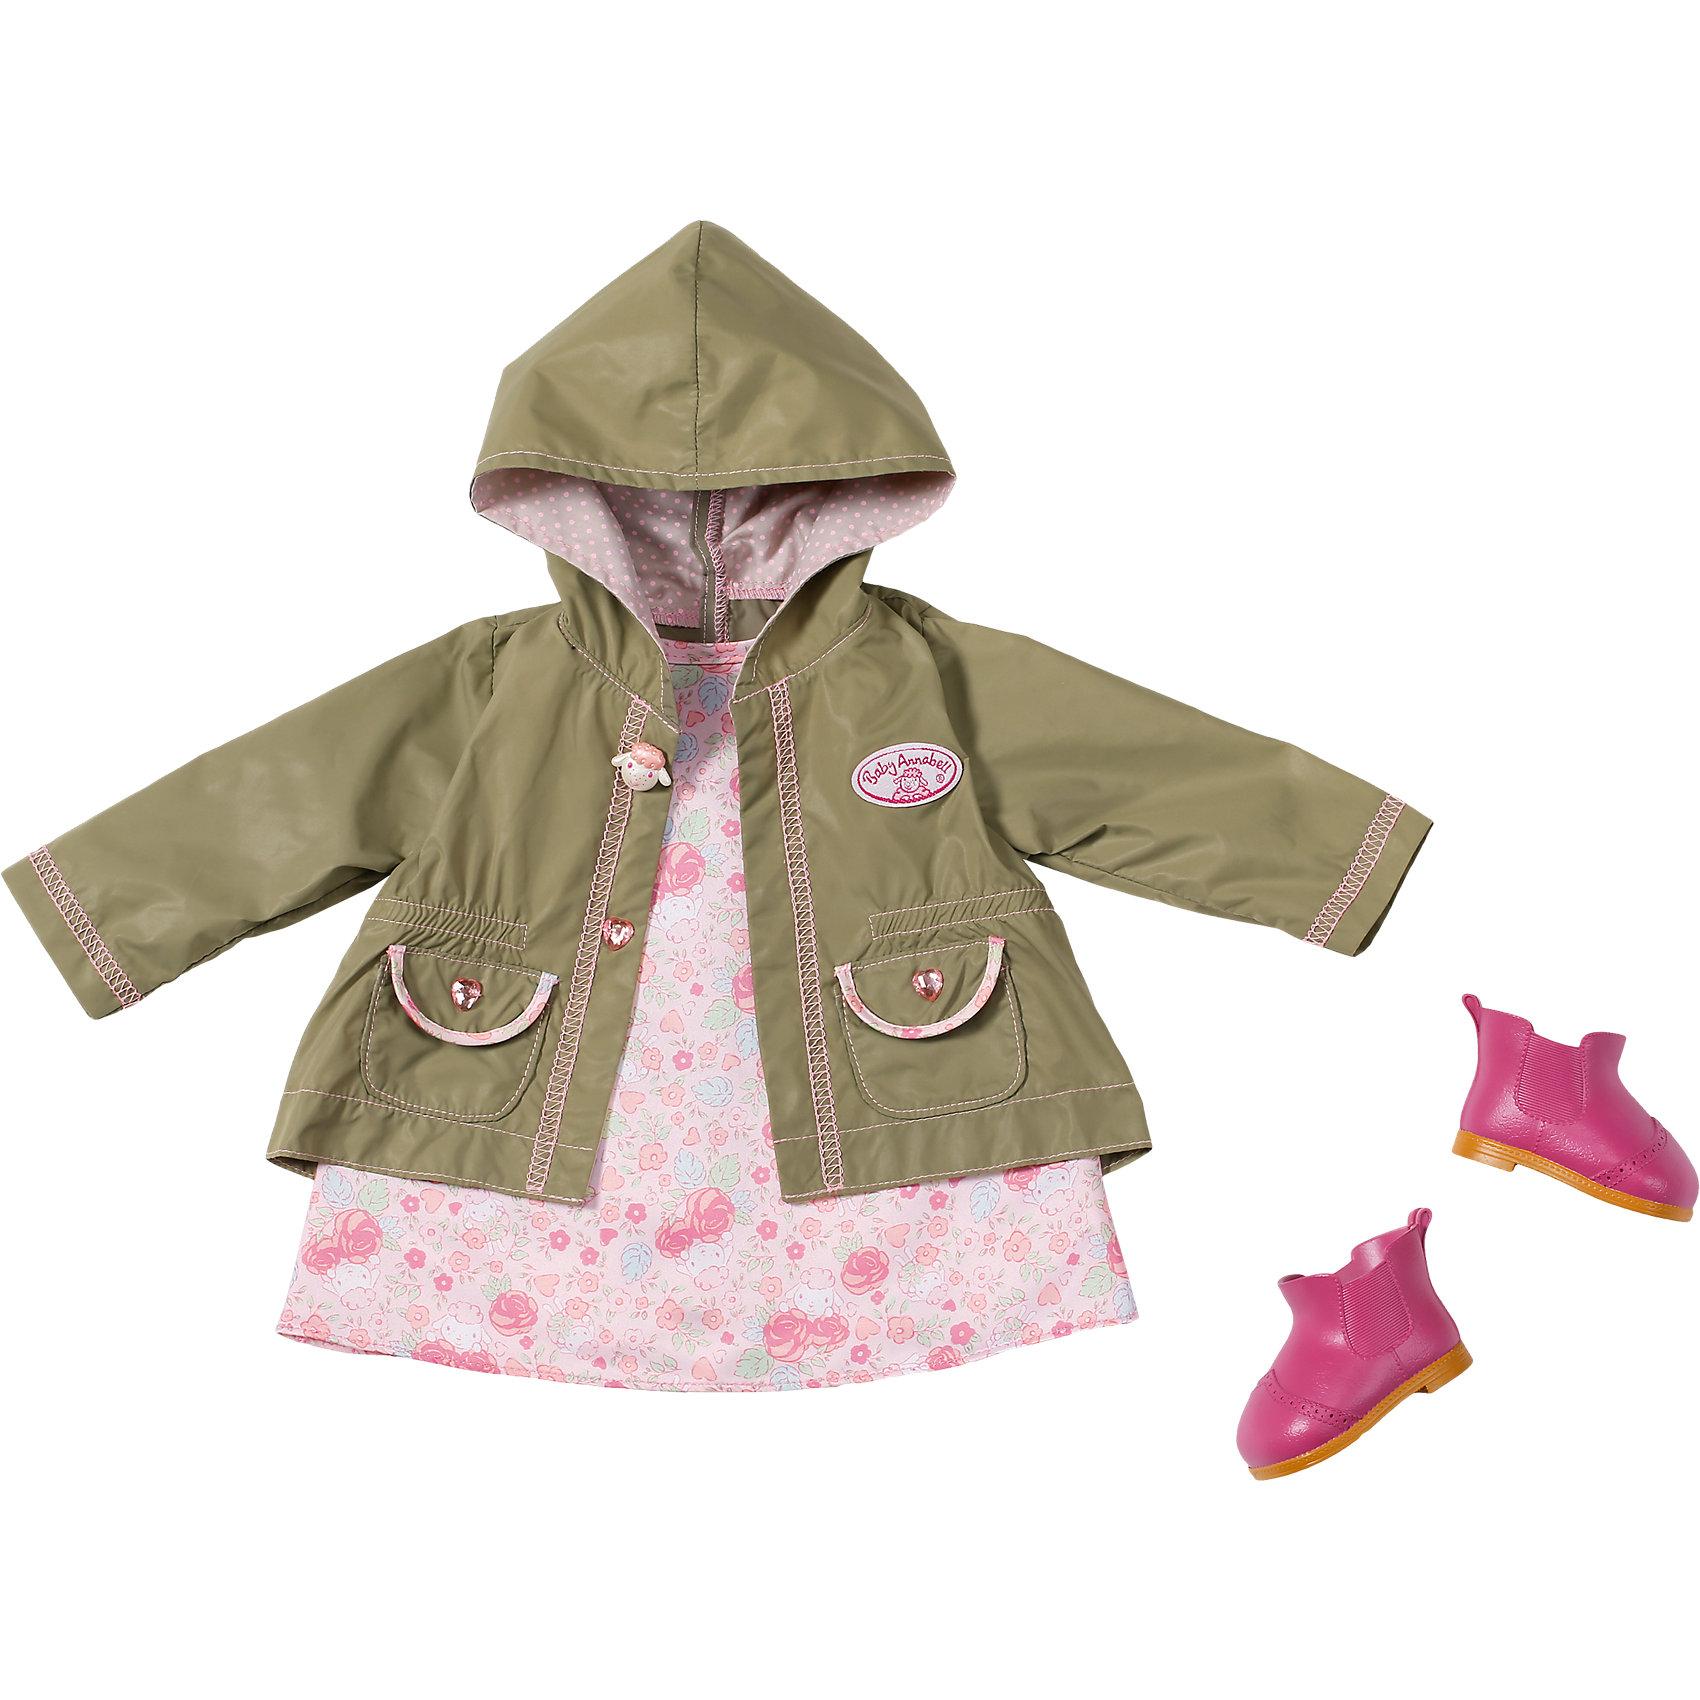 Zapf Creation Одежда демисезонная, Baby Annabell купить в москве хсн одежда